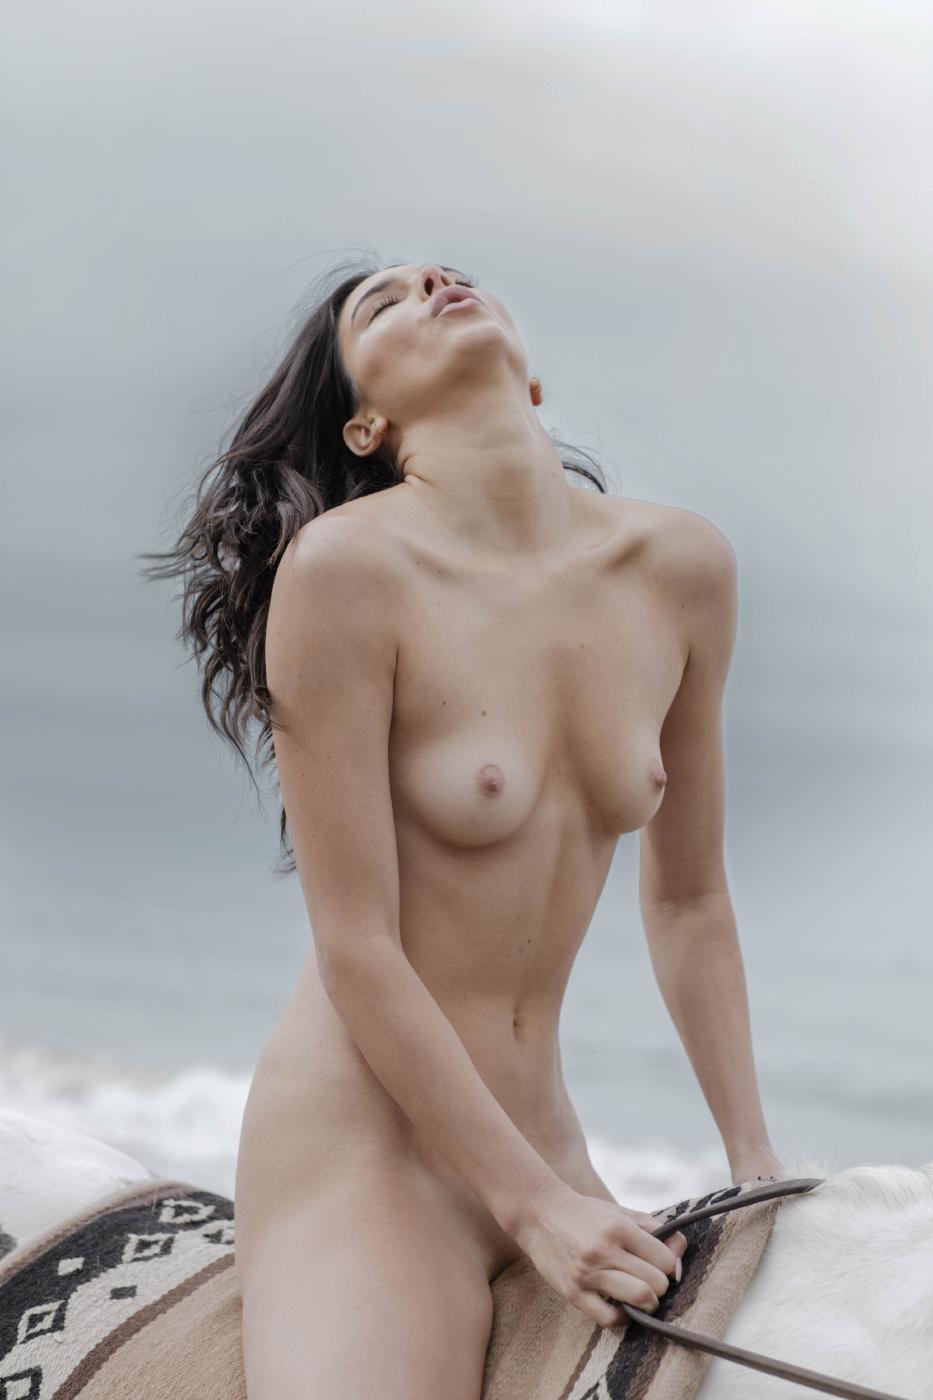 Kendall Jenner Nude Angels Magazine Photoshoot Yuywvy